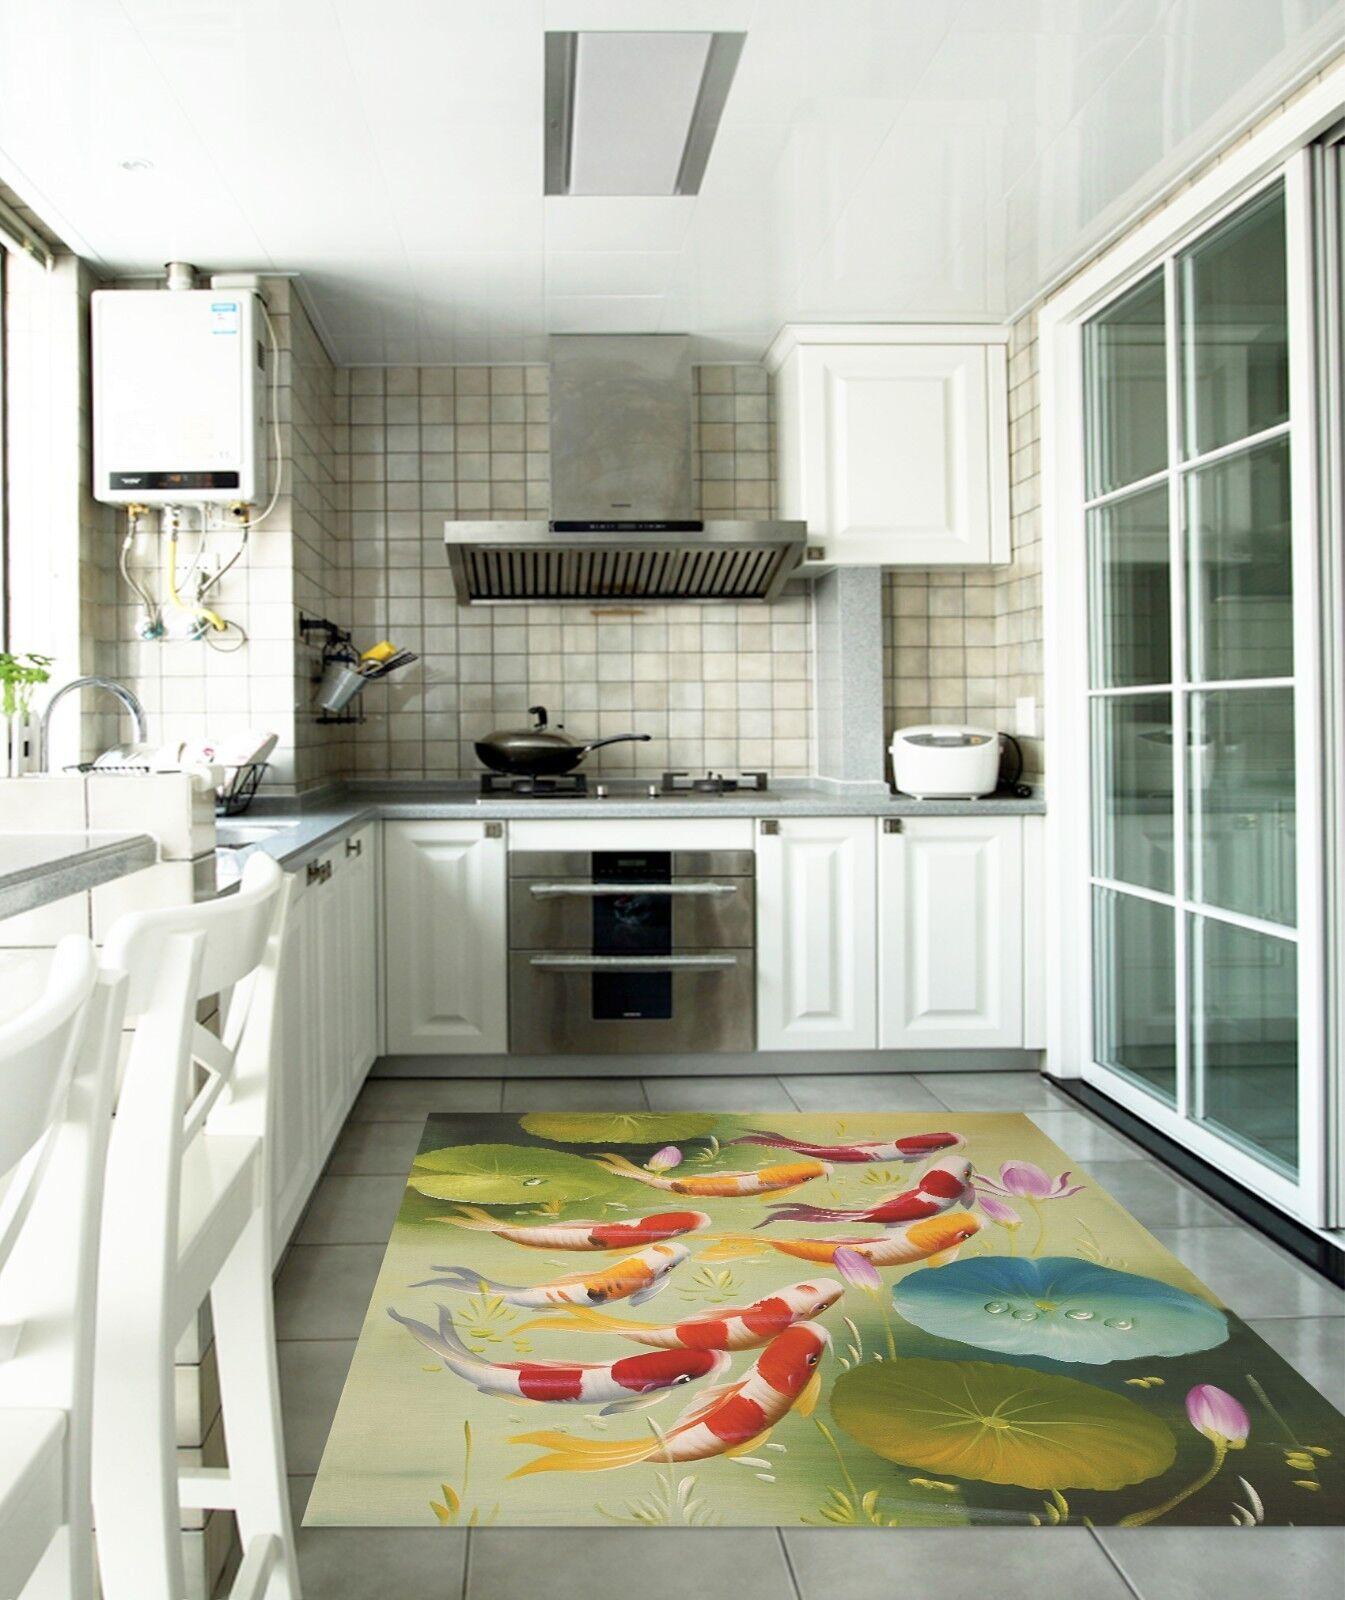 3D Pond Carp 767 Kitchen Mat Floor Murals Wall Print Wall Deco UK Carly